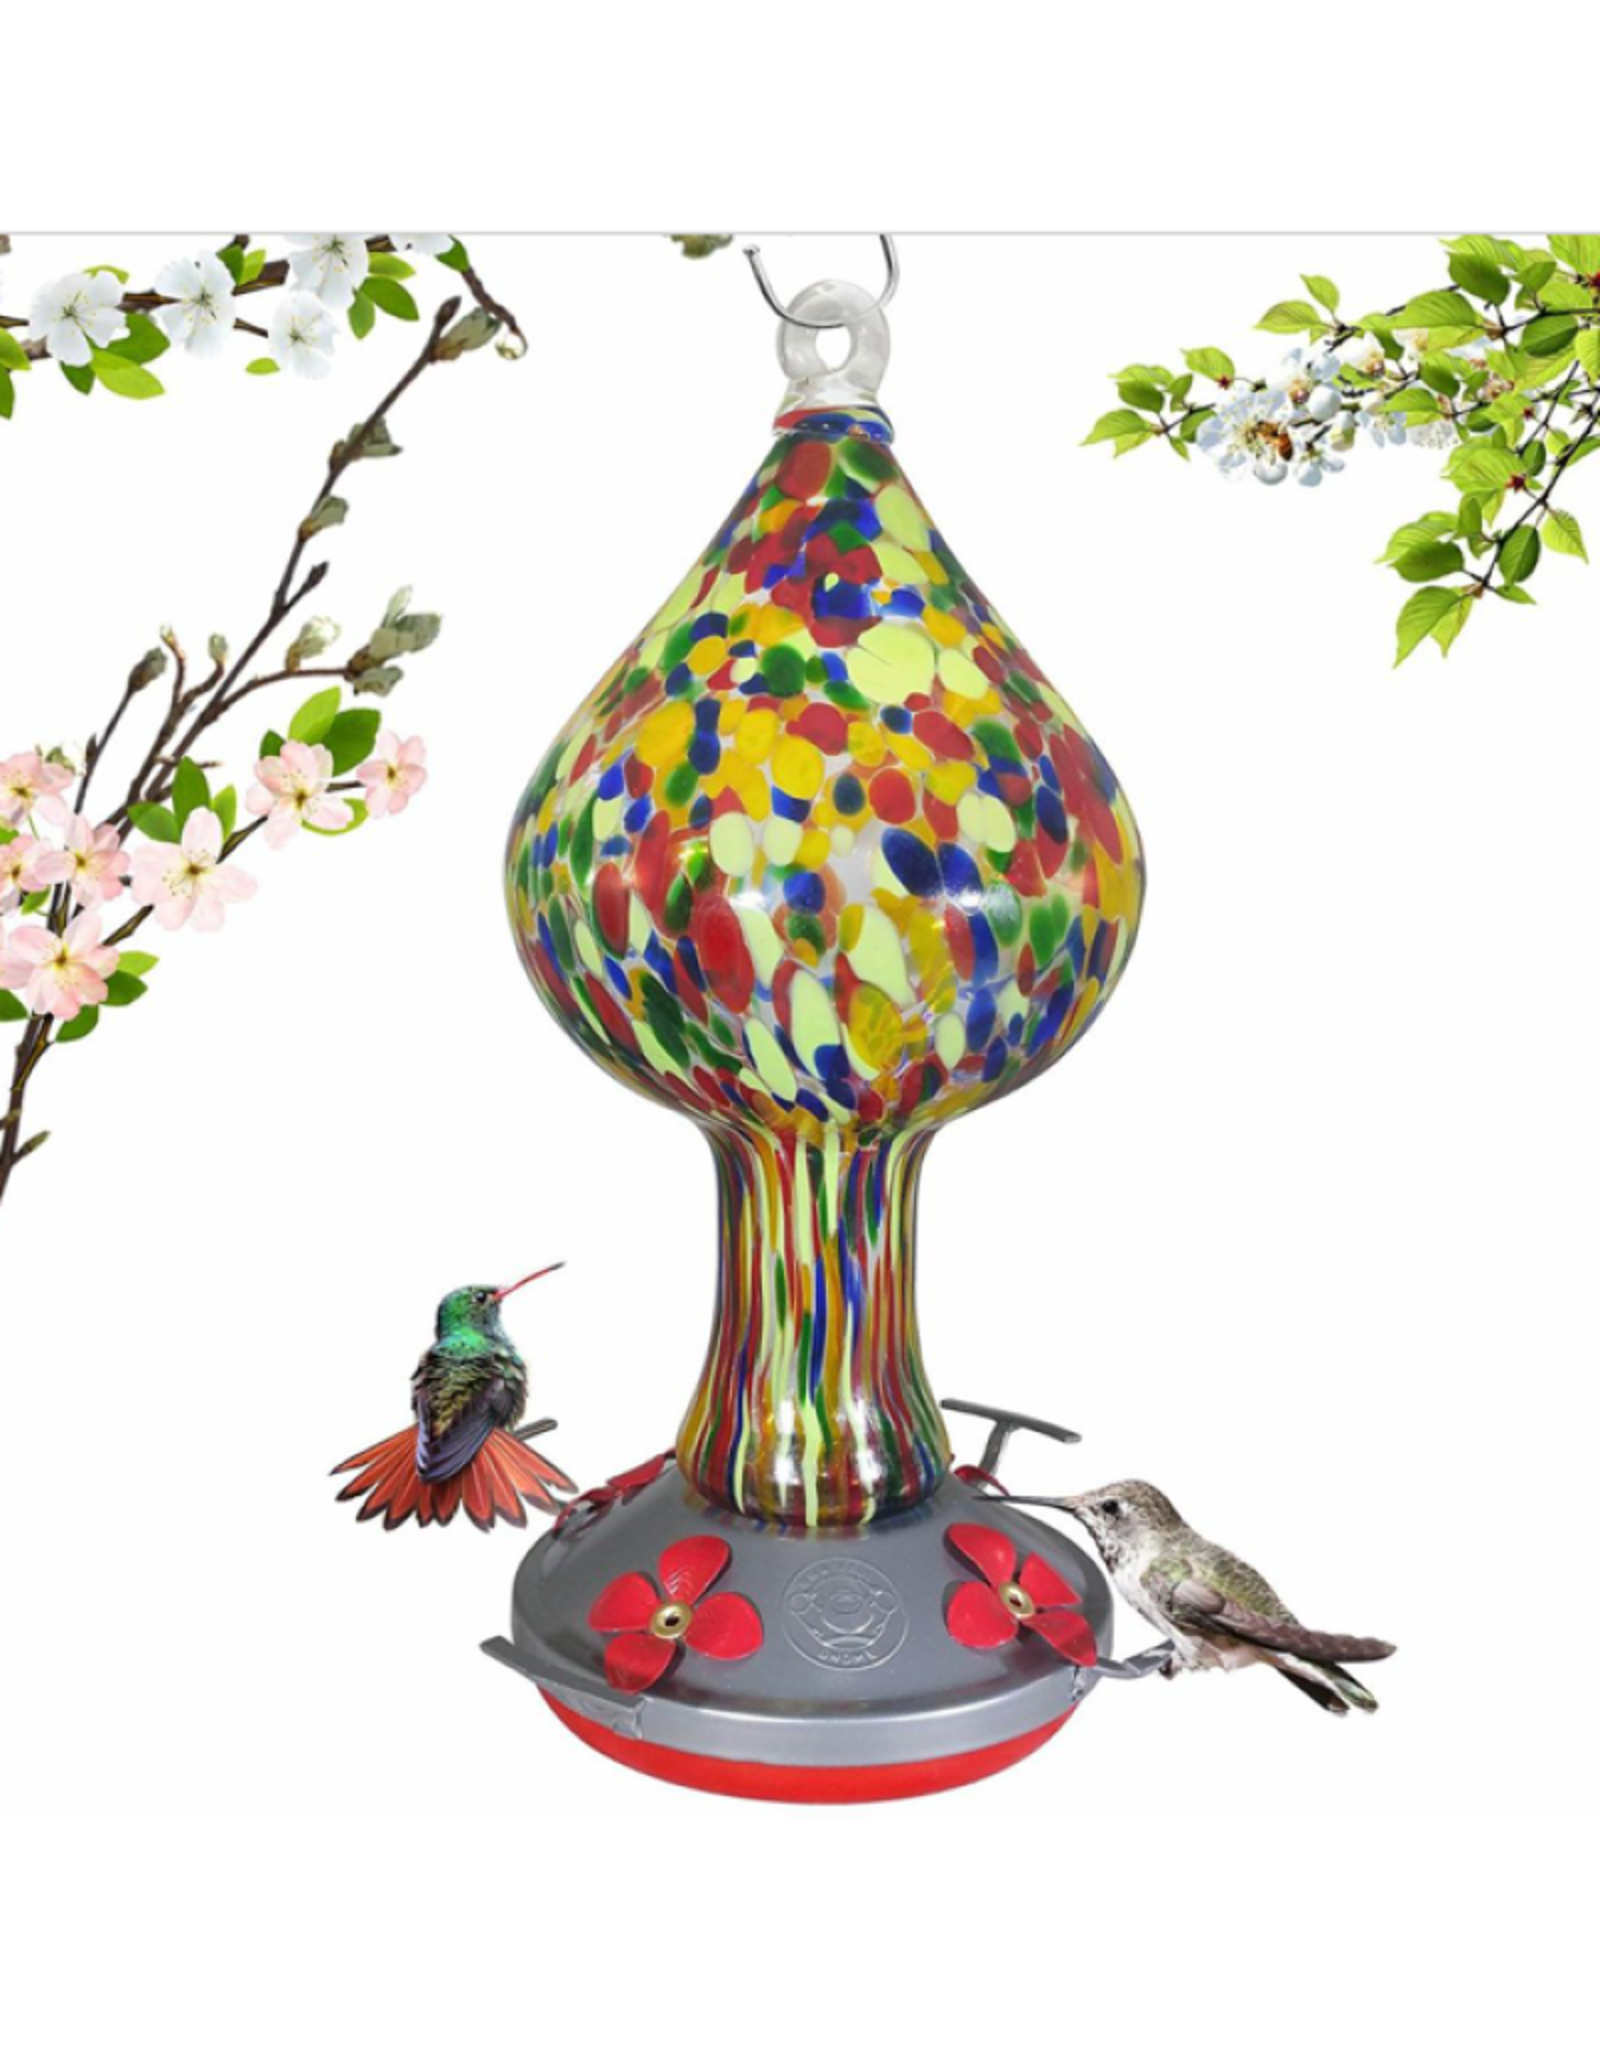 Hummingbird Feeder - Colorful Mushroom Warm Tones